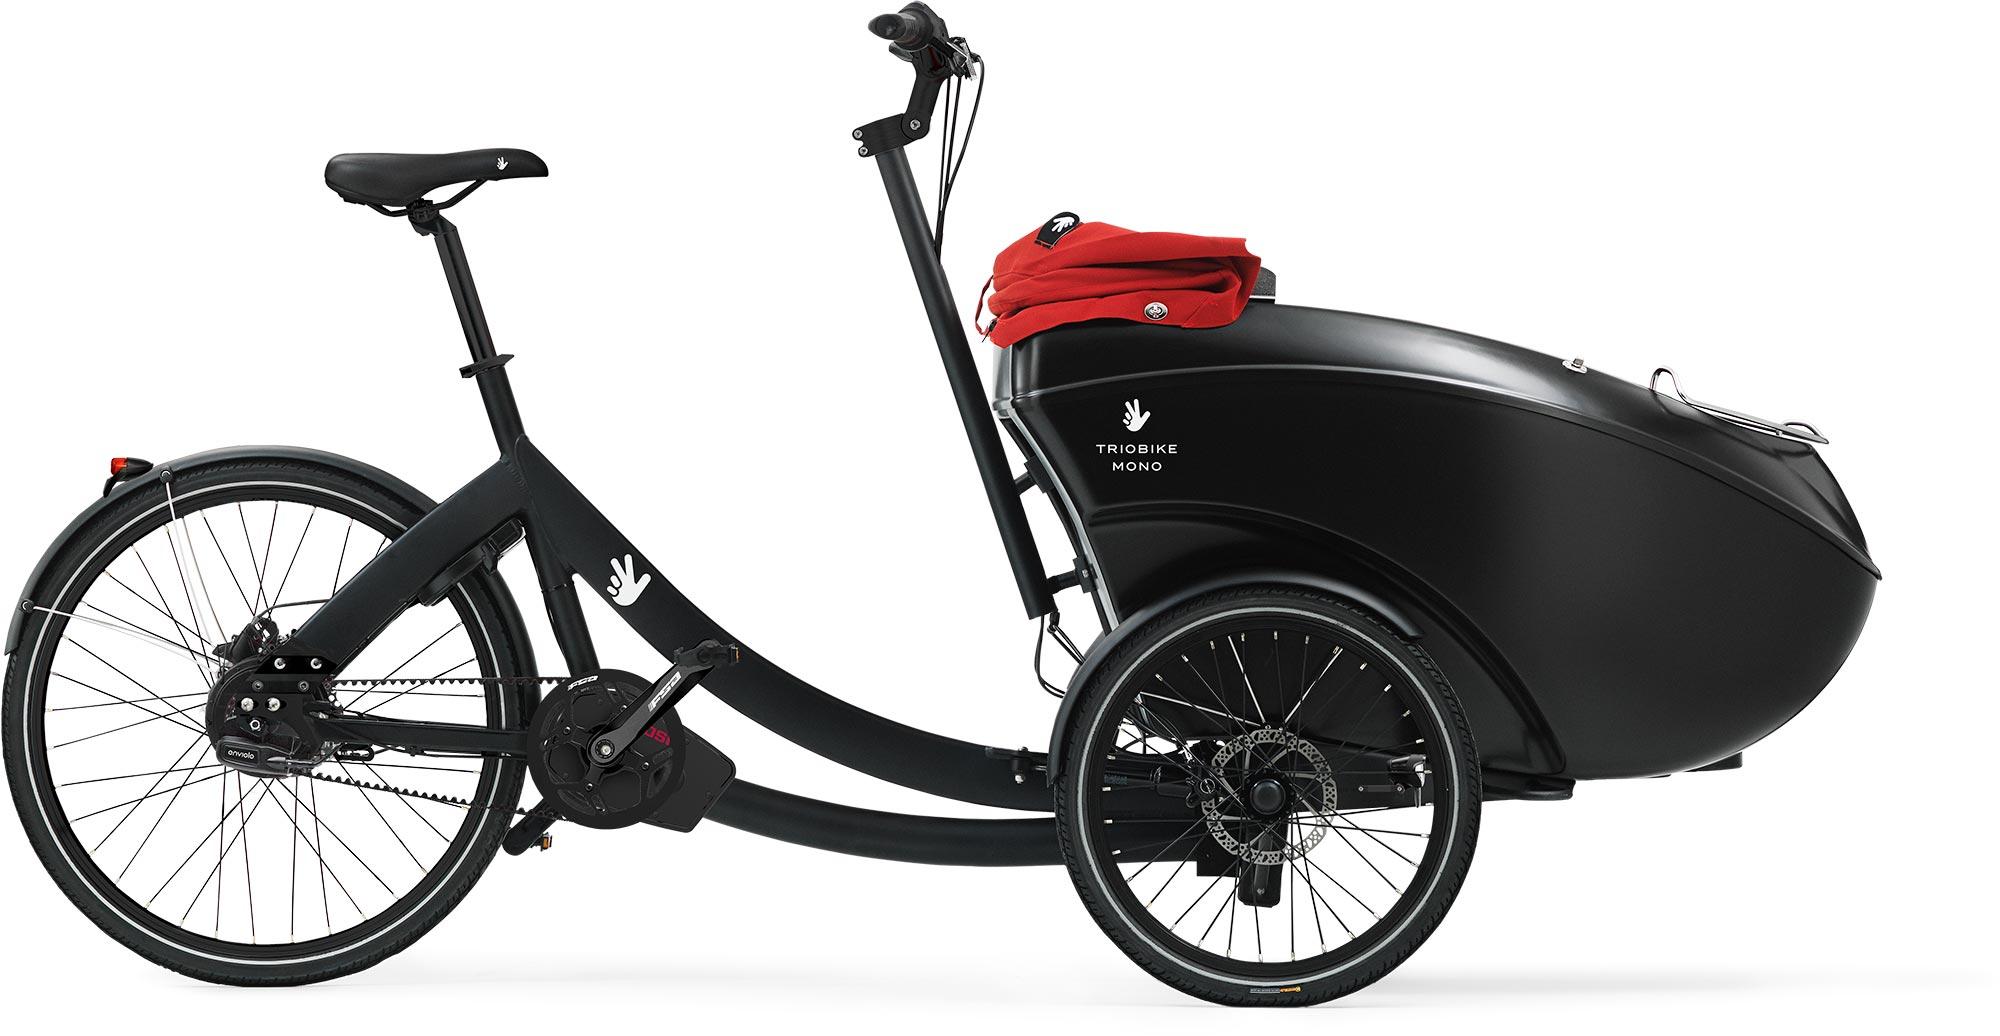 Triobike Mono E Lasten e-Bike / Cargo e-Bike 2019